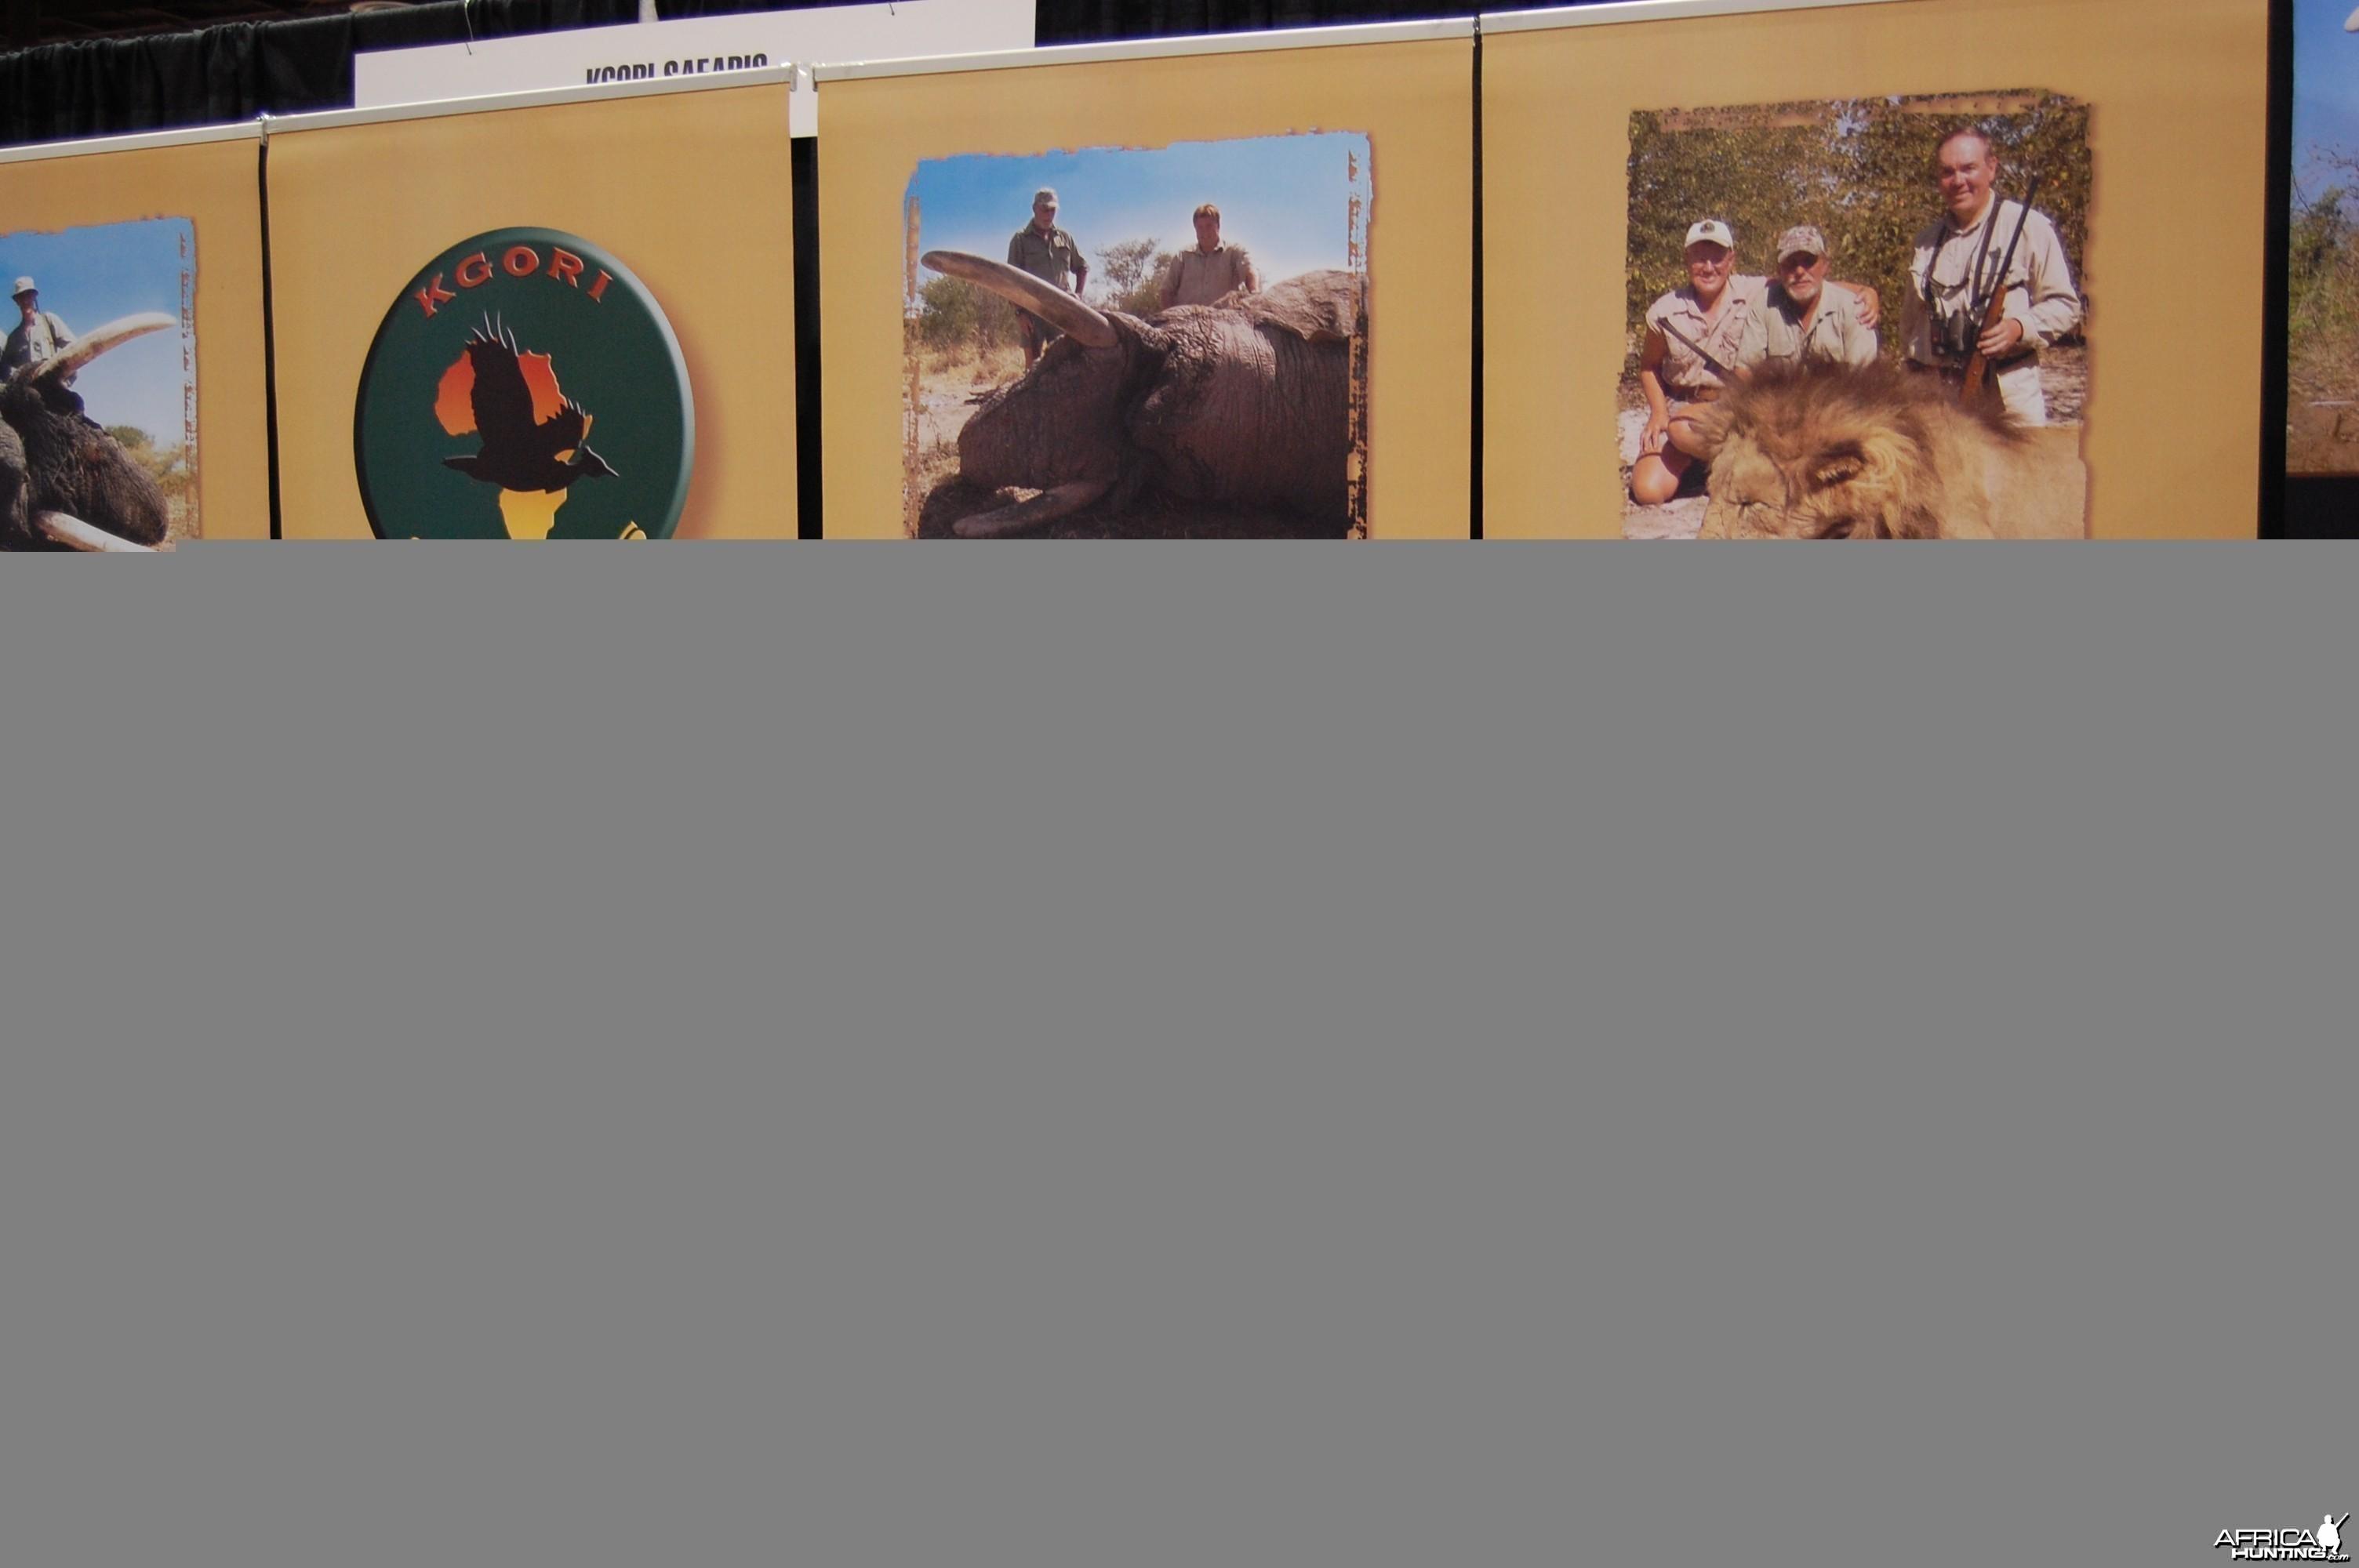 Kgori Safaris